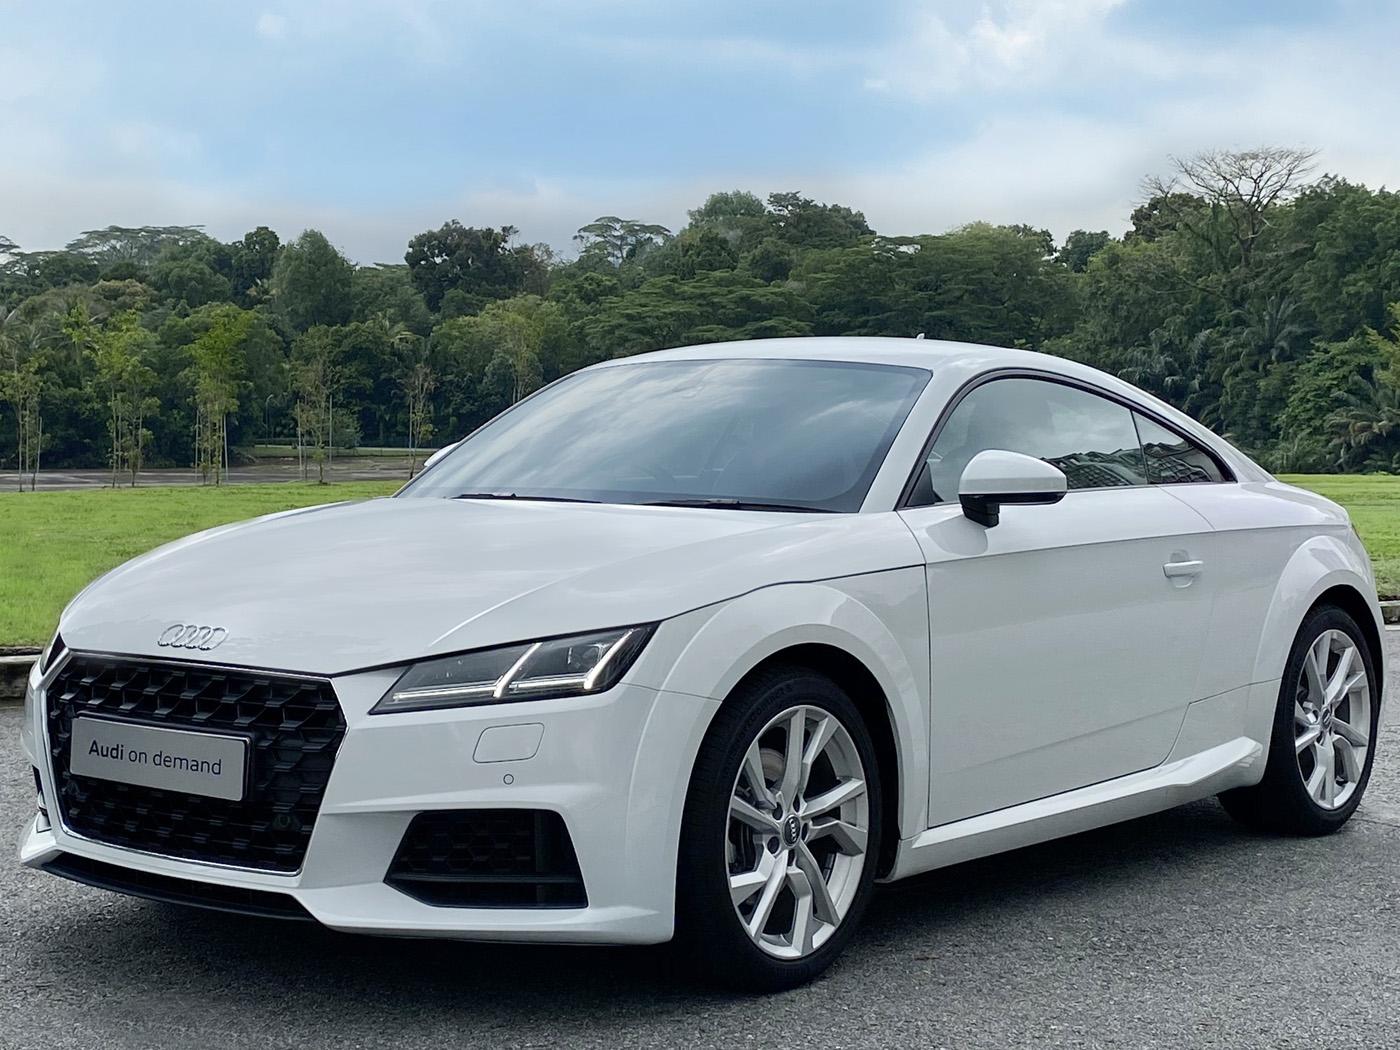 Audi TT Coupé 2.0 TFSI S tronic (For Rent)